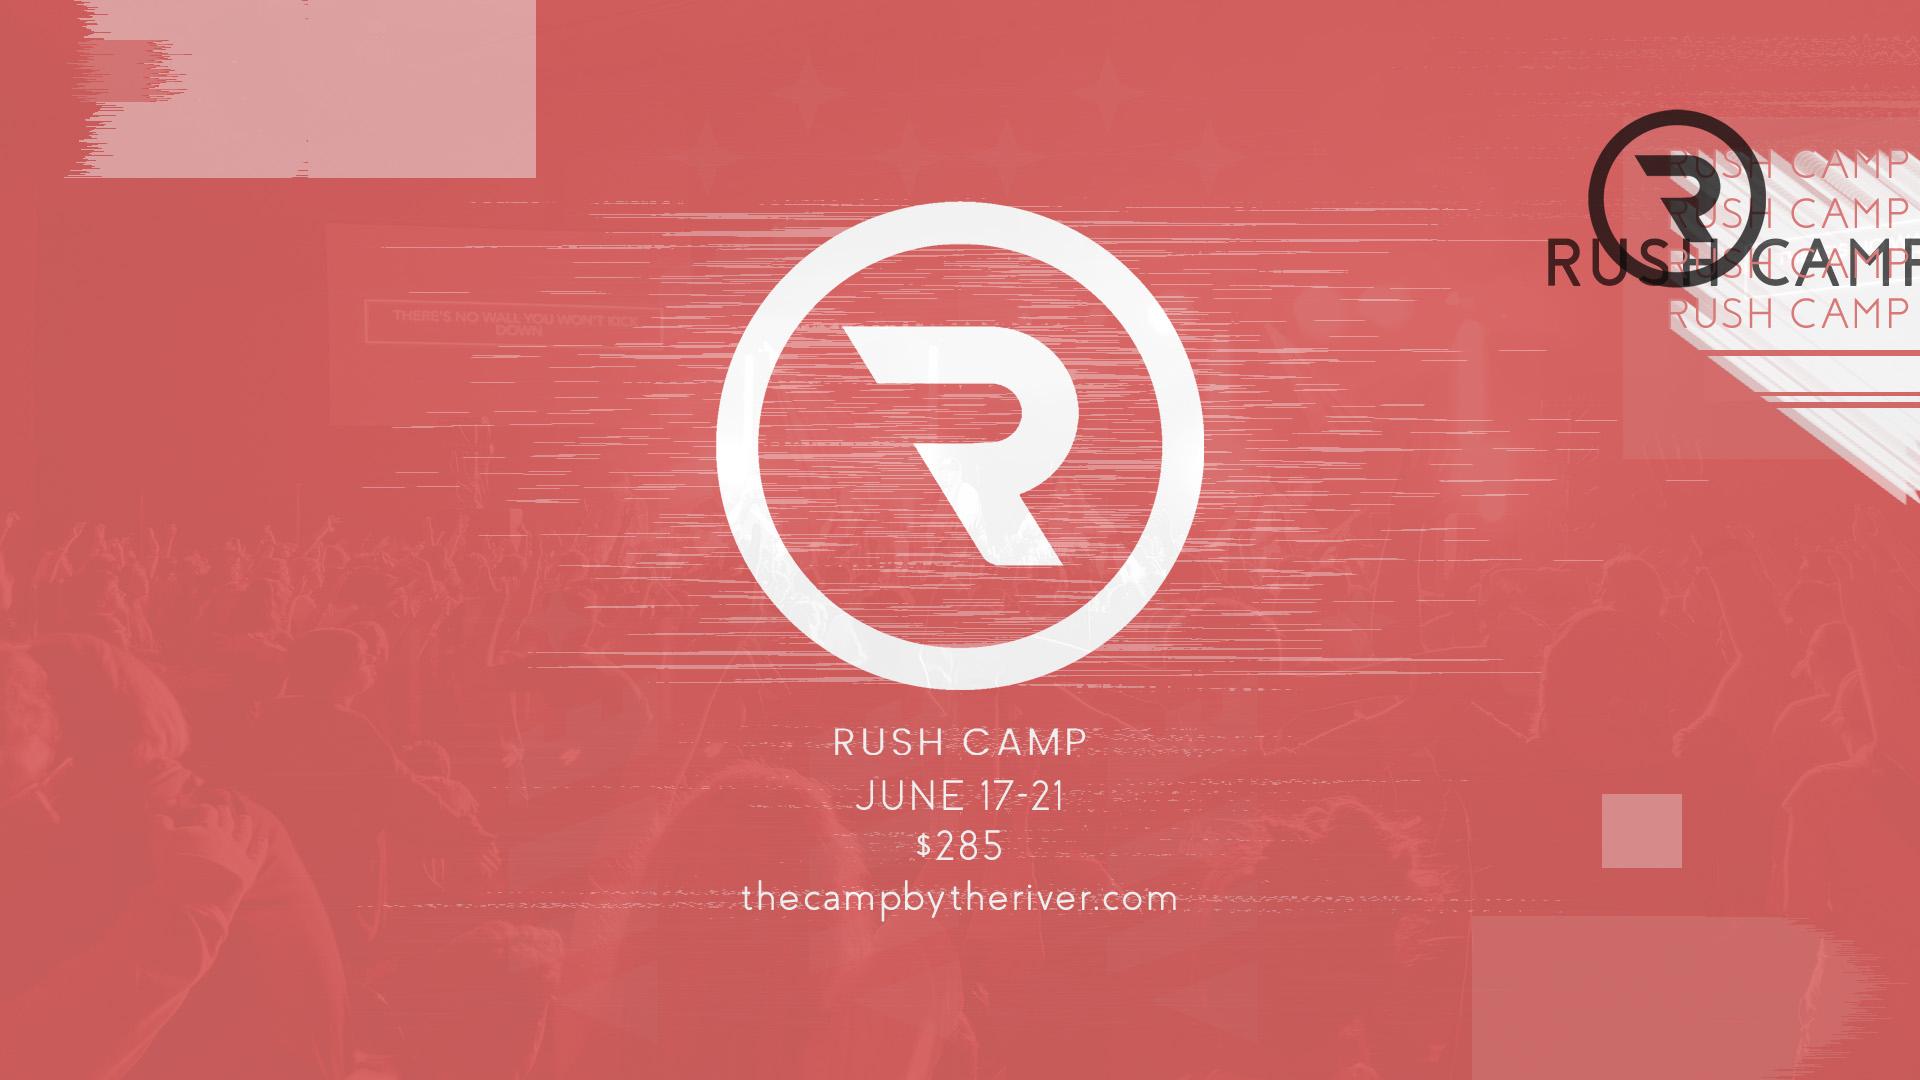 RushCampSLideMain.jpg